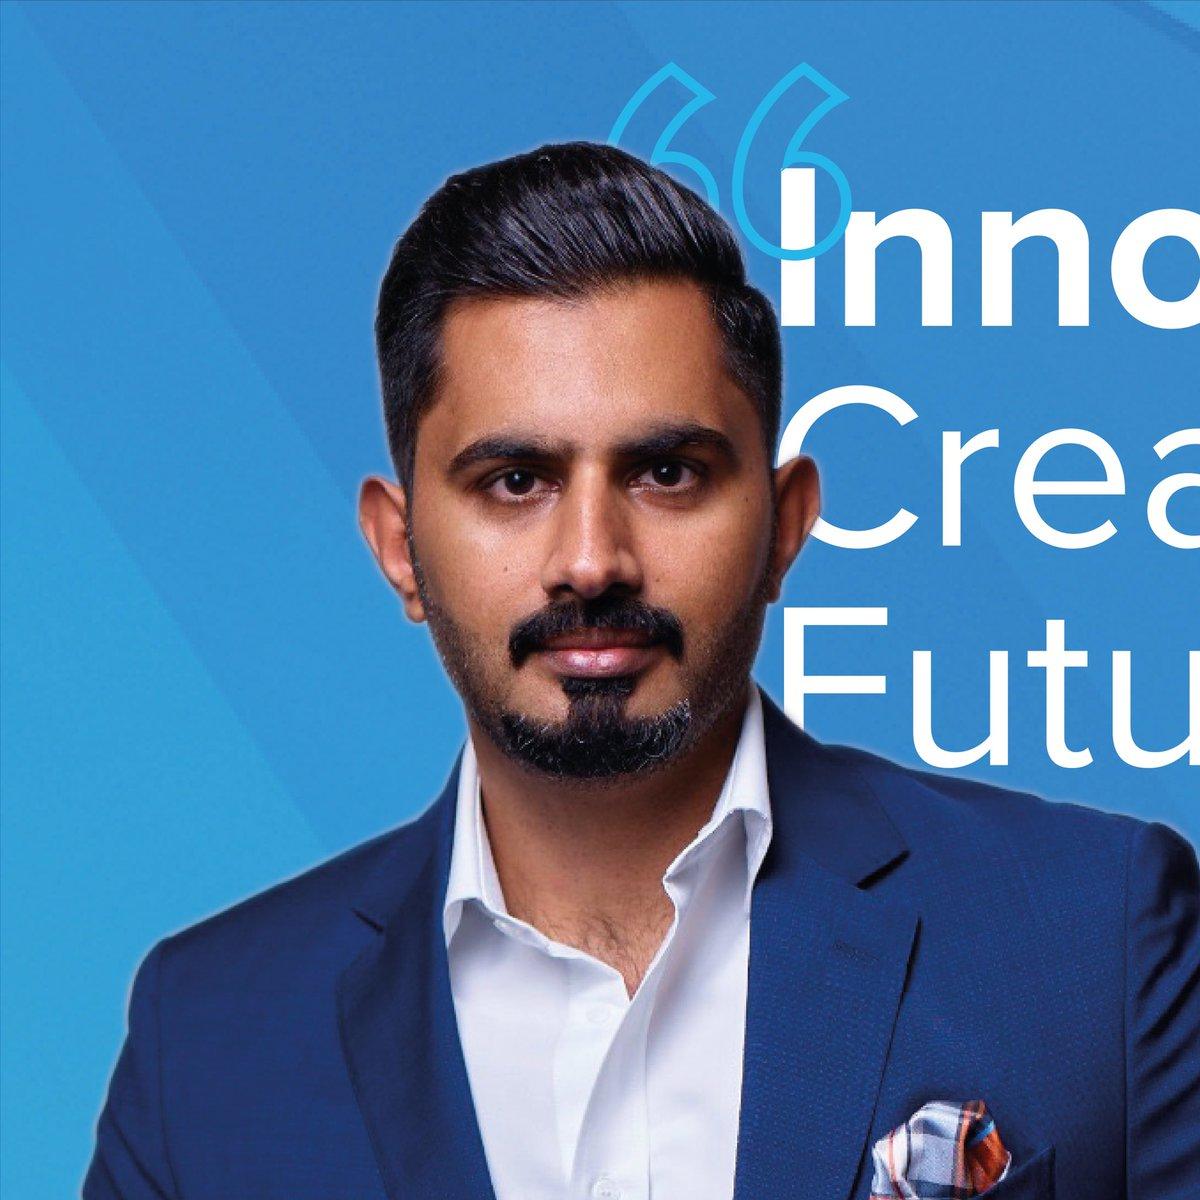 We focus on your needs but we look at them from a reverse engineered future perspective in mind. – Aamir Shehzad   #socialmedia #bahrain #saudiarabia #future   نحن نركز على احتياجاتك ولكننا ننظر إليها من منظور مستقبلي ، هندسي،و عكسي. -عامر شهزاد   #السعودية #الرياض #السعودية https://t.co/JzCJh208kH